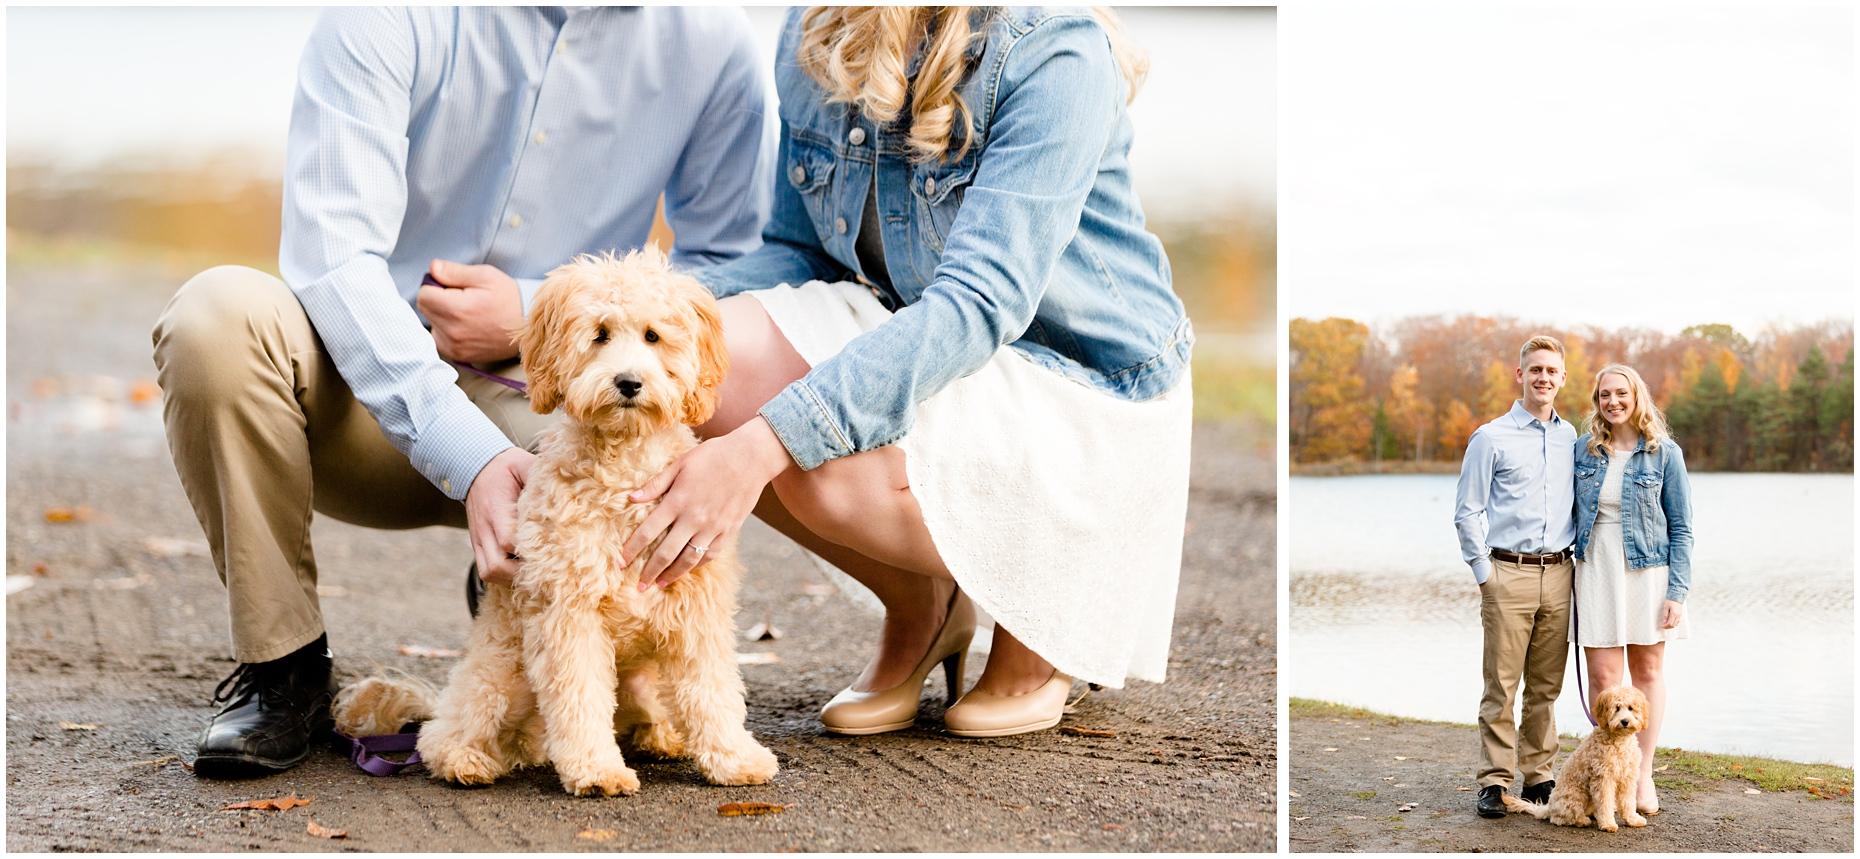 chestnut_ridge_park_engagement_photography_puppy_fall_hamburg_orchard_park